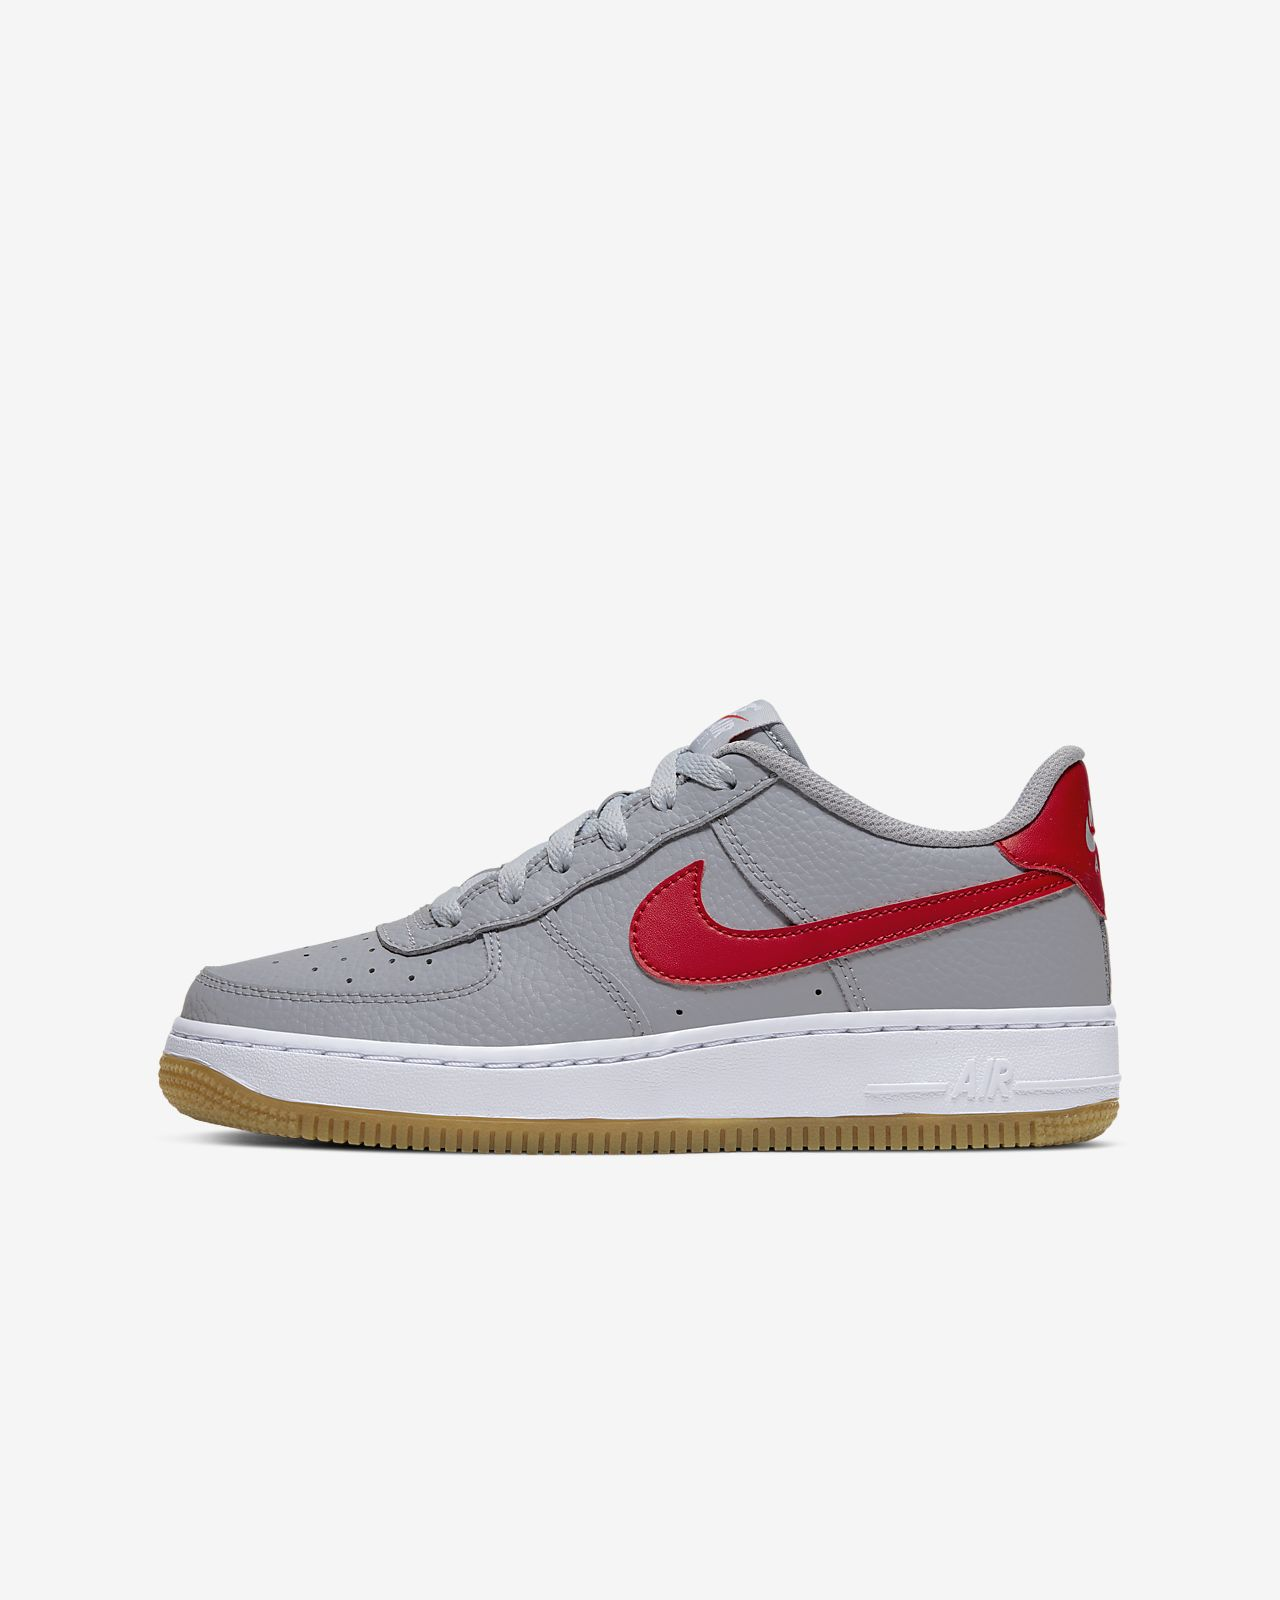 Nike Air Force 1 2 Big Kids' Shoe